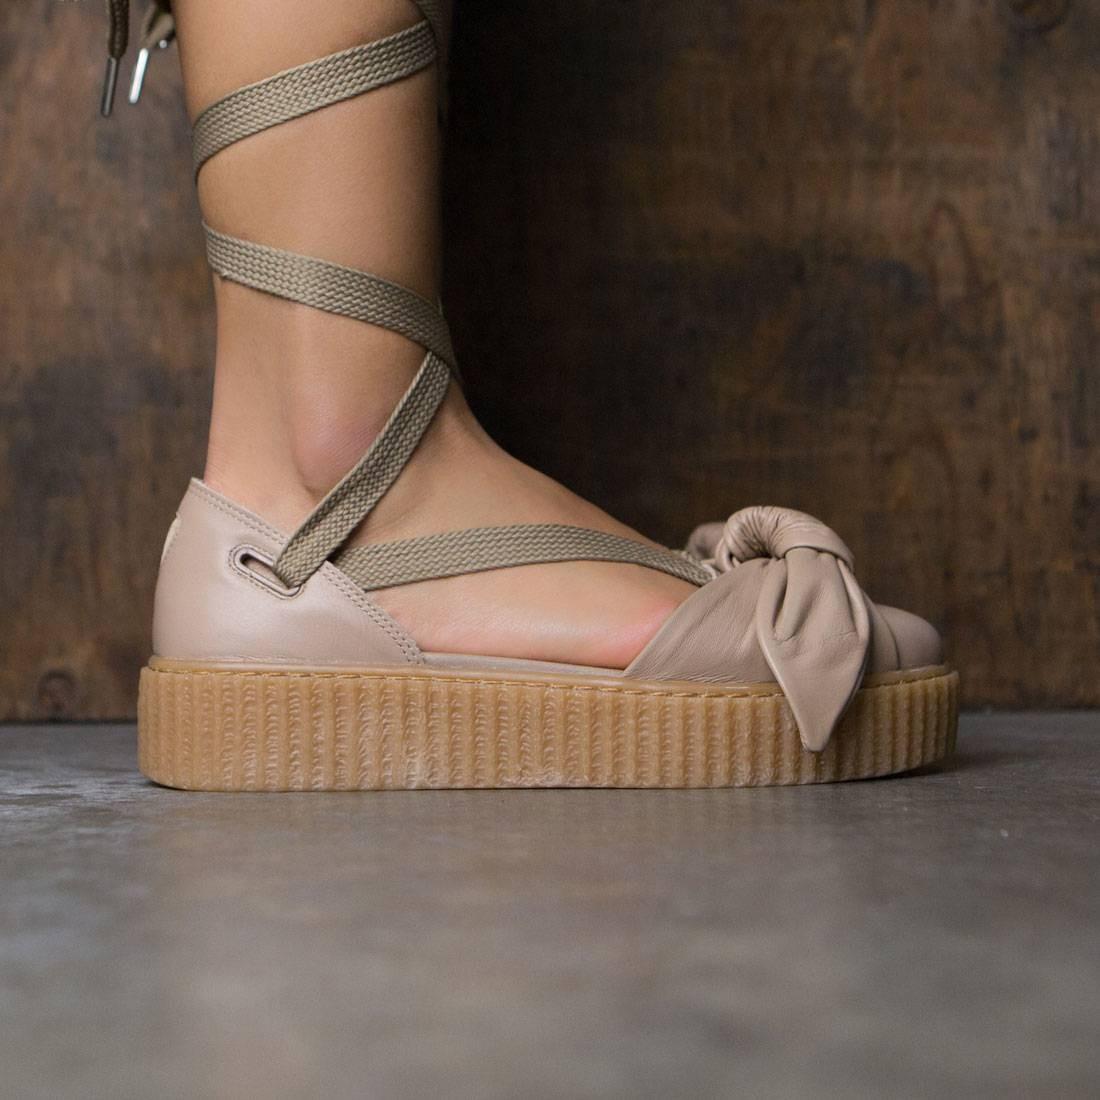 Puma x Fenty By Rihanna Women Bow Creeper Sandal (natural / oatmeal)